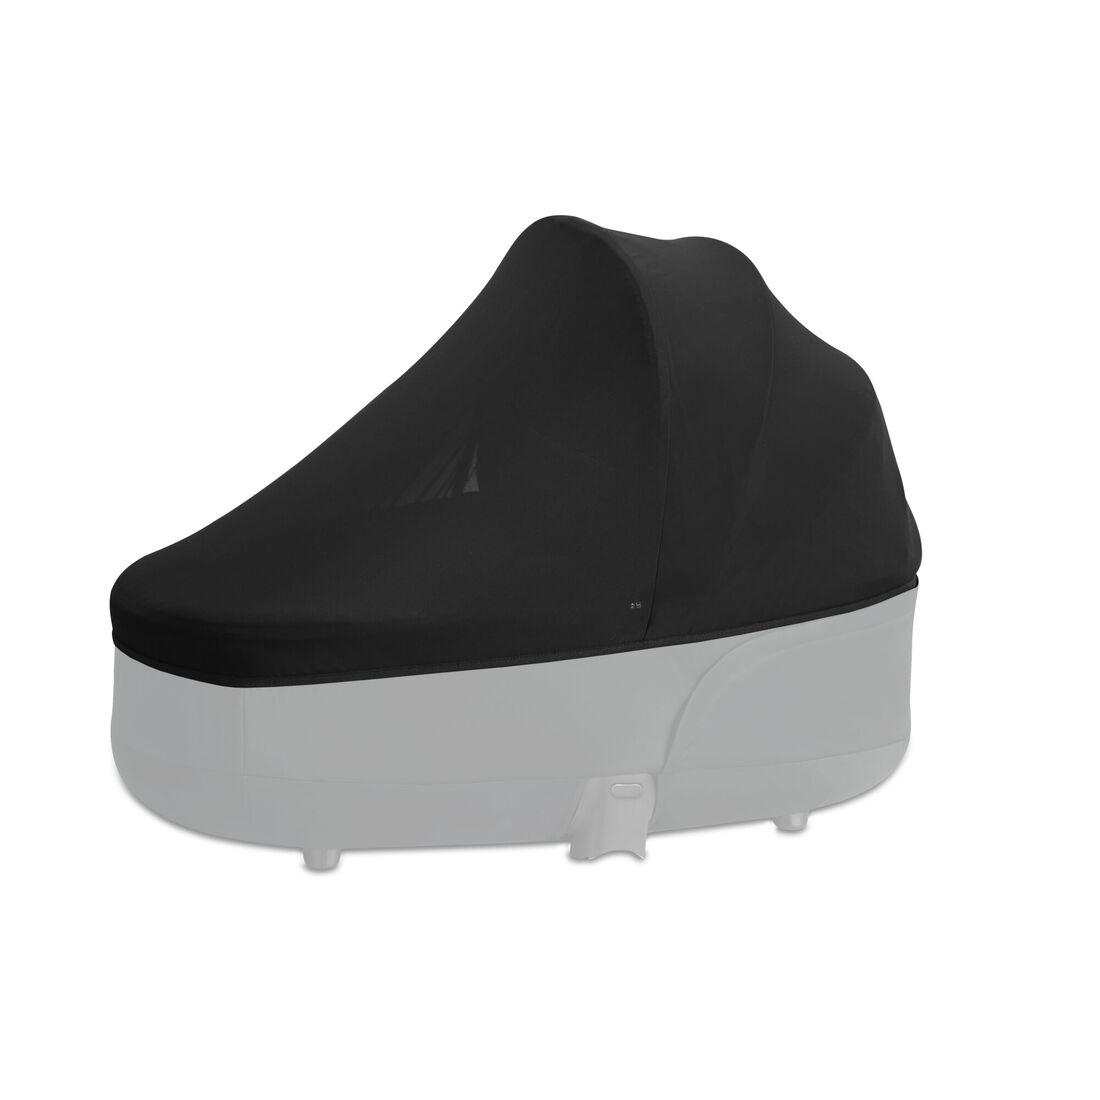 CYBEX Insektennetz Stroller Lux Carry Cots - Black in Black large Bild 1